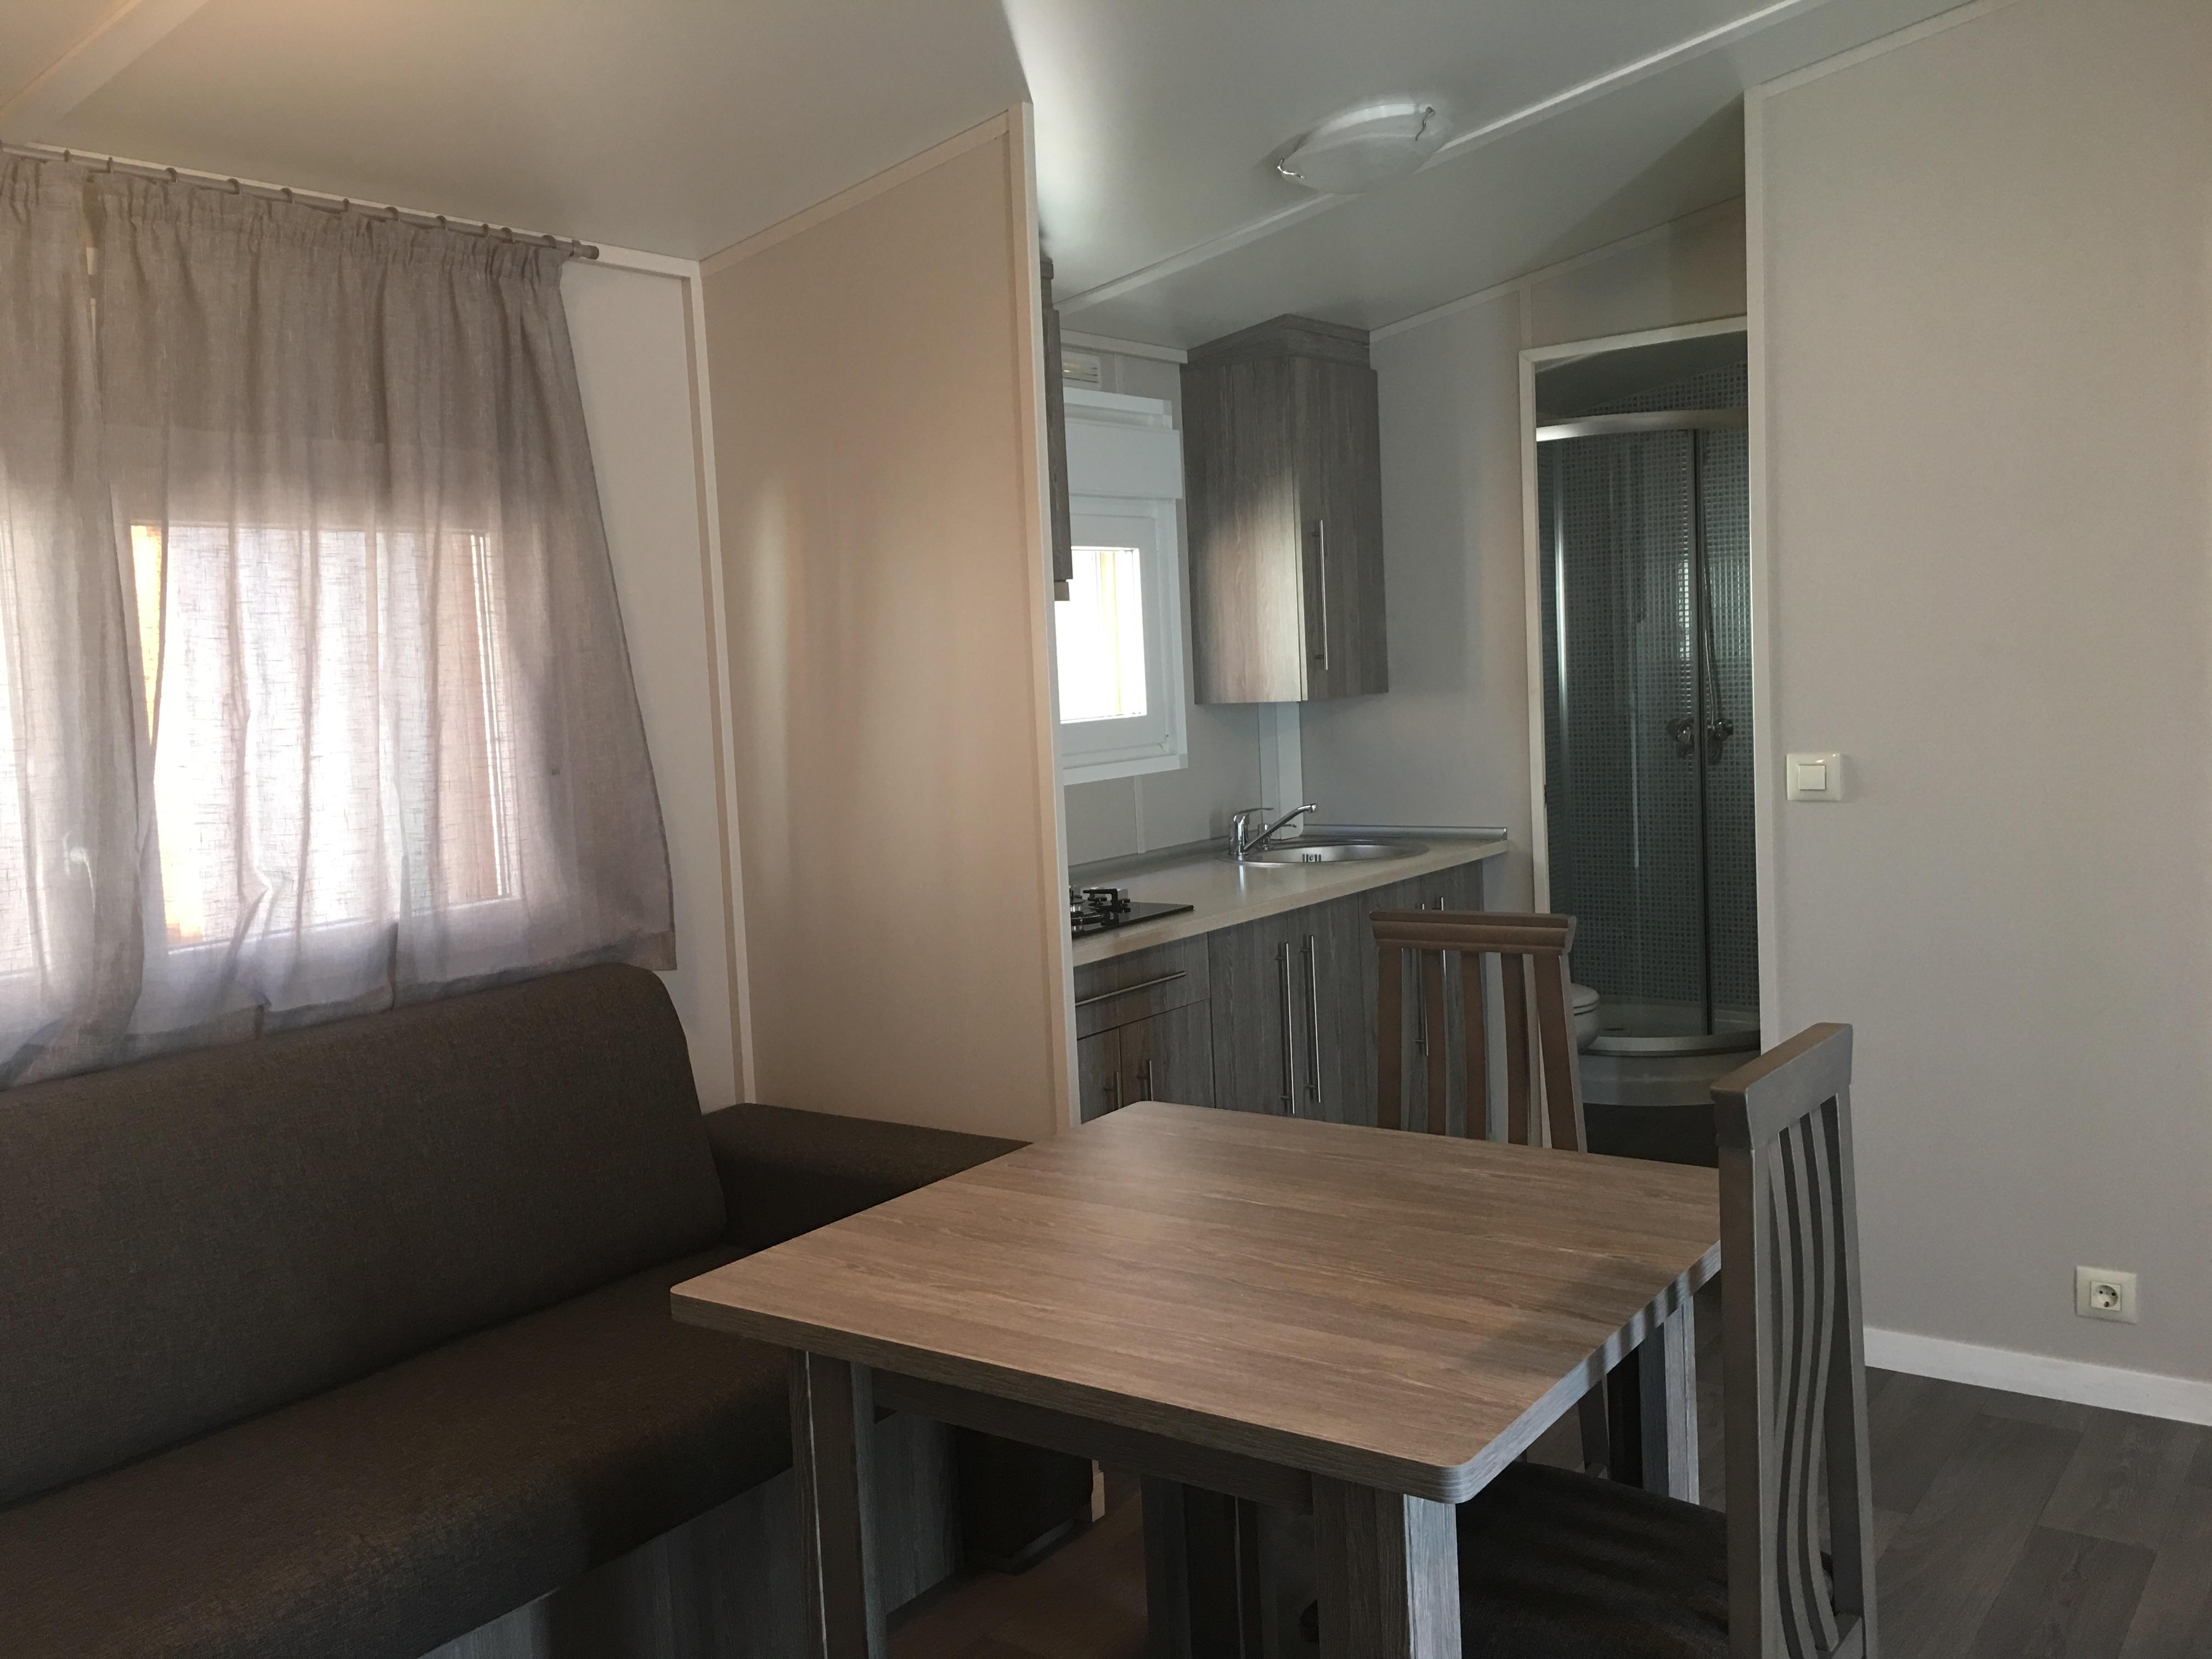 Ofertas mobil home ebro confort bardenas casas m viles jarama Casas moviles jarama